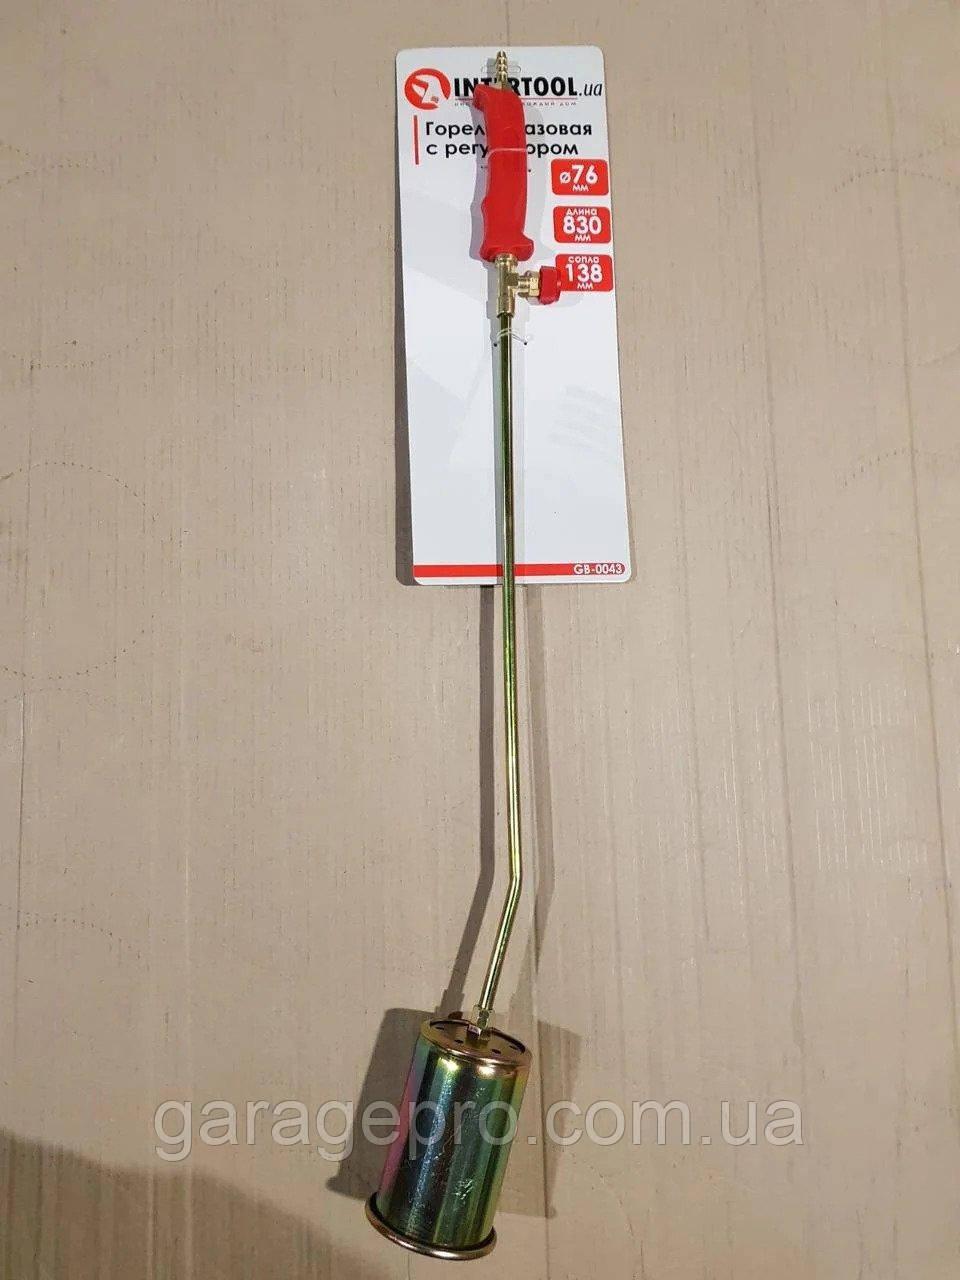 Горелка газовая с регулятором 830мм, сопло138мм, Ø76мм. INTERTOOL GB-0043